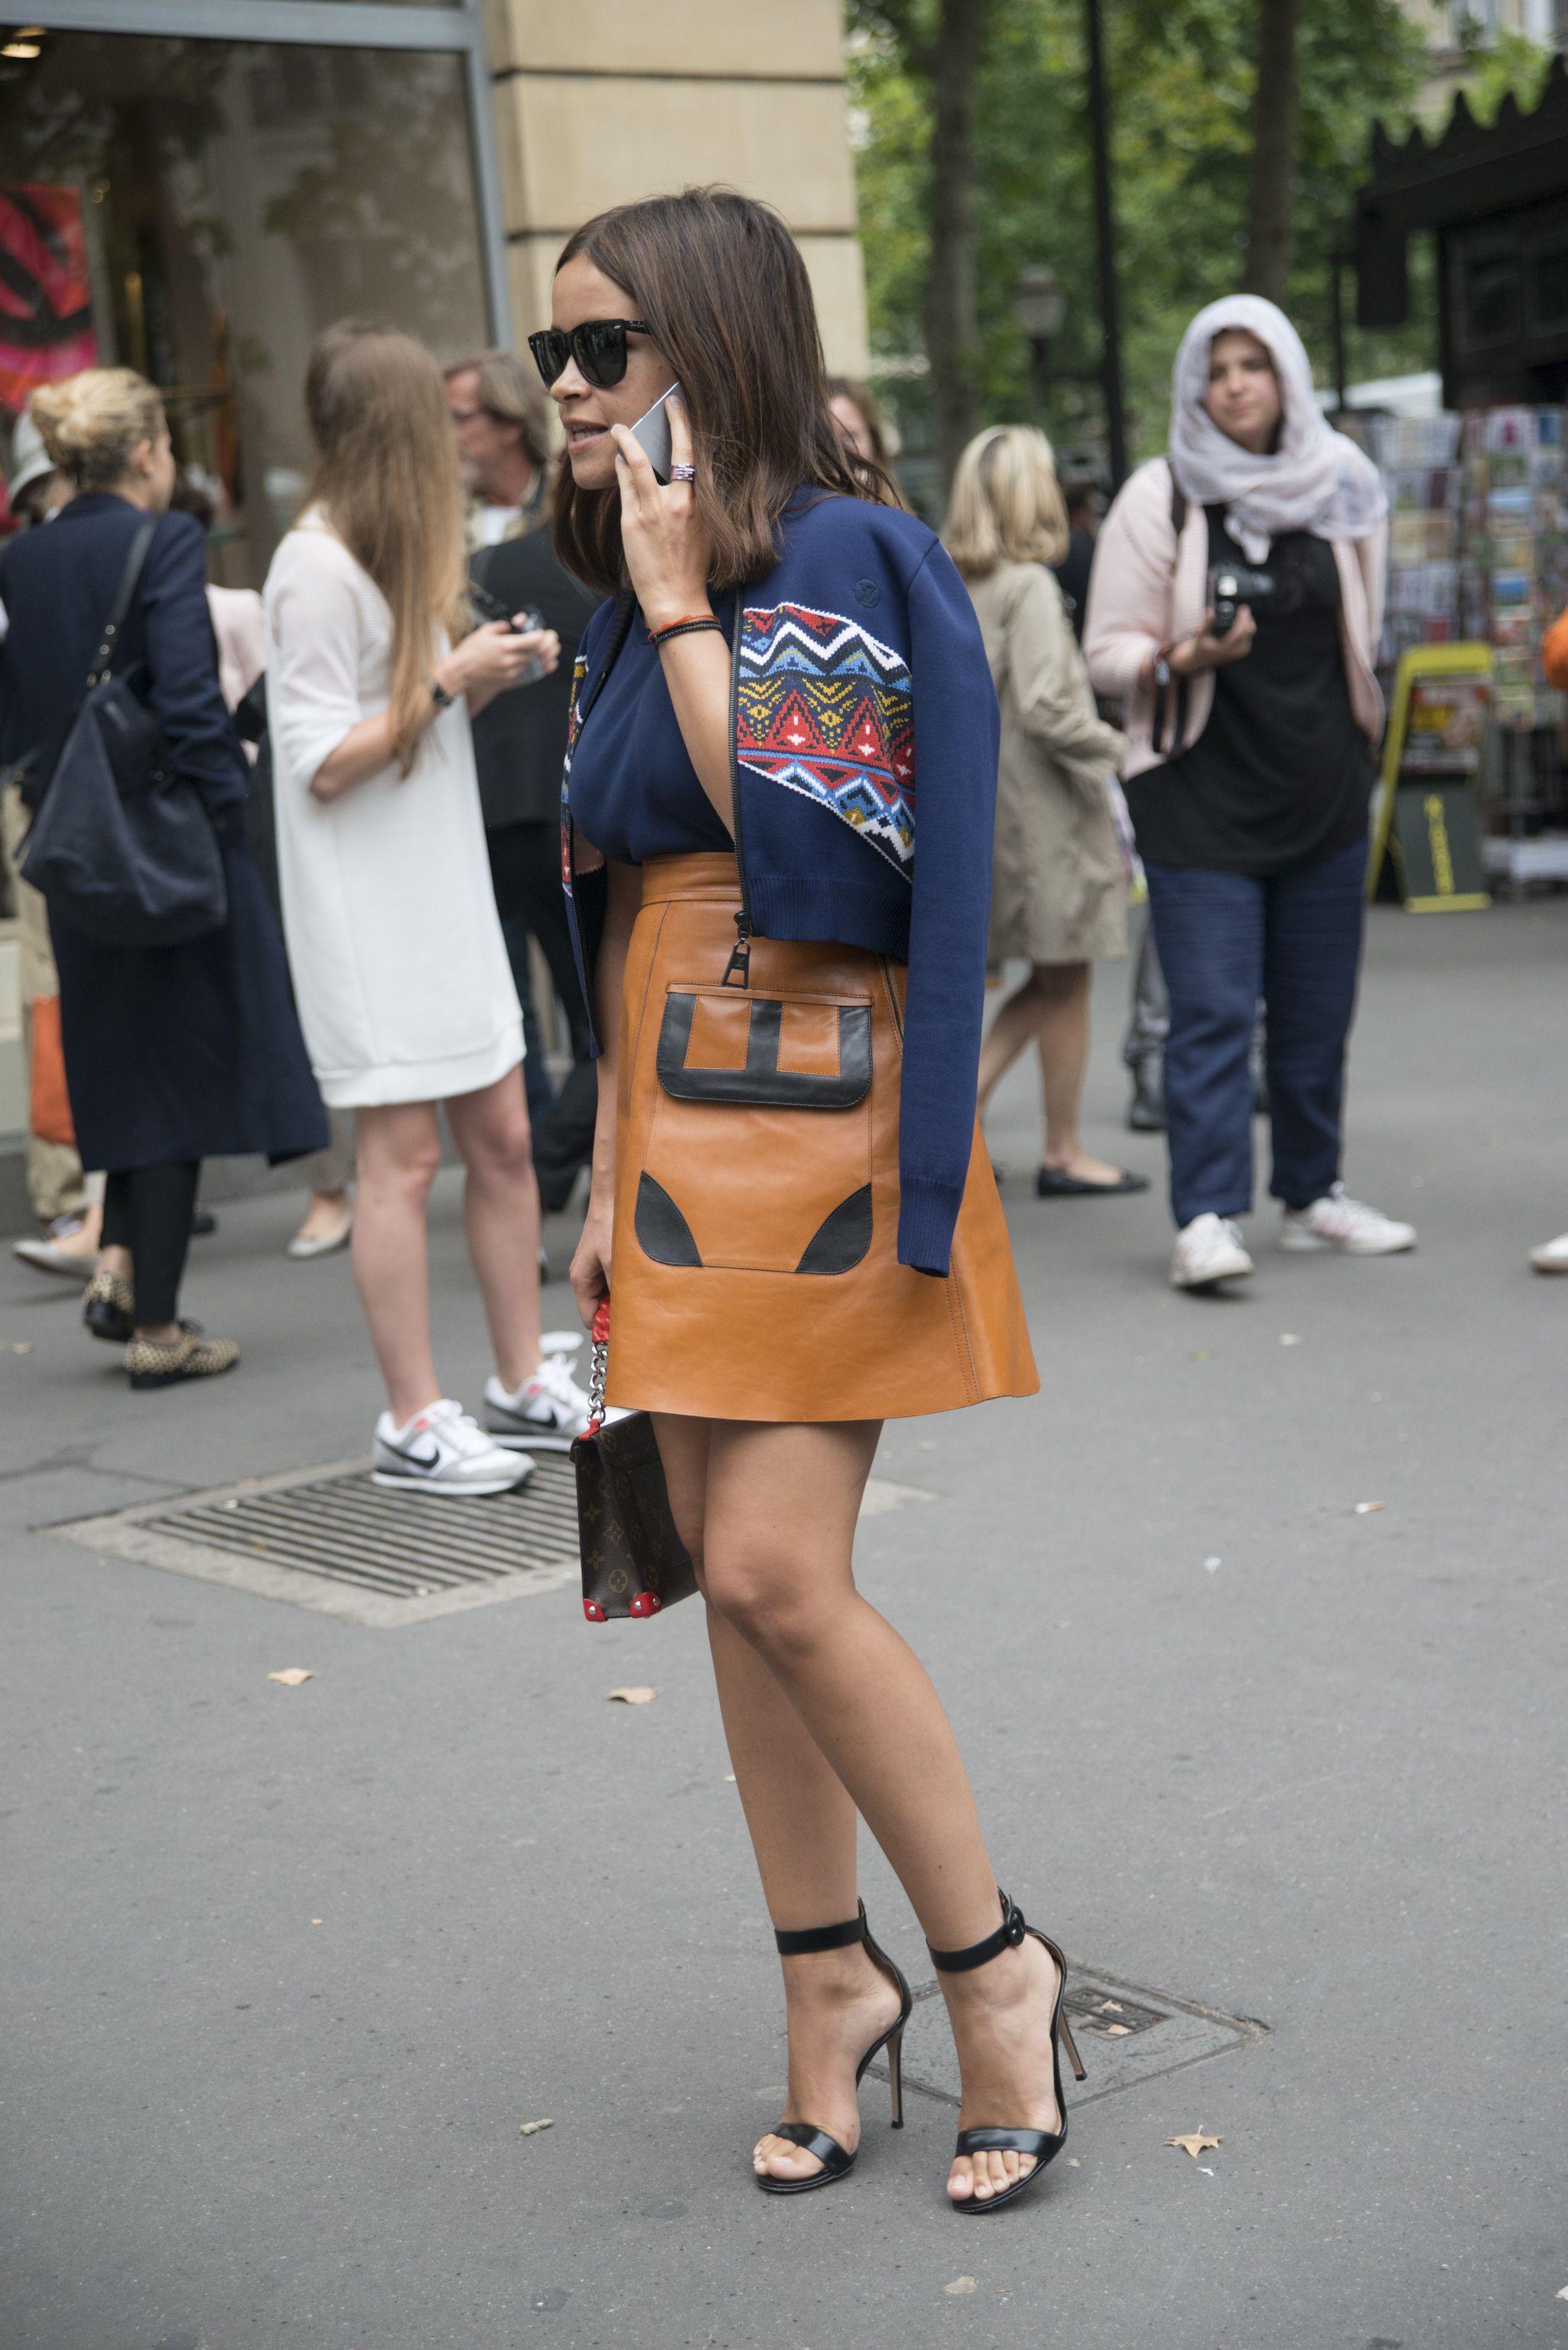 Street Style Stars Maternity & Pregnancy Style At Fashion Week   Grazia Fashion